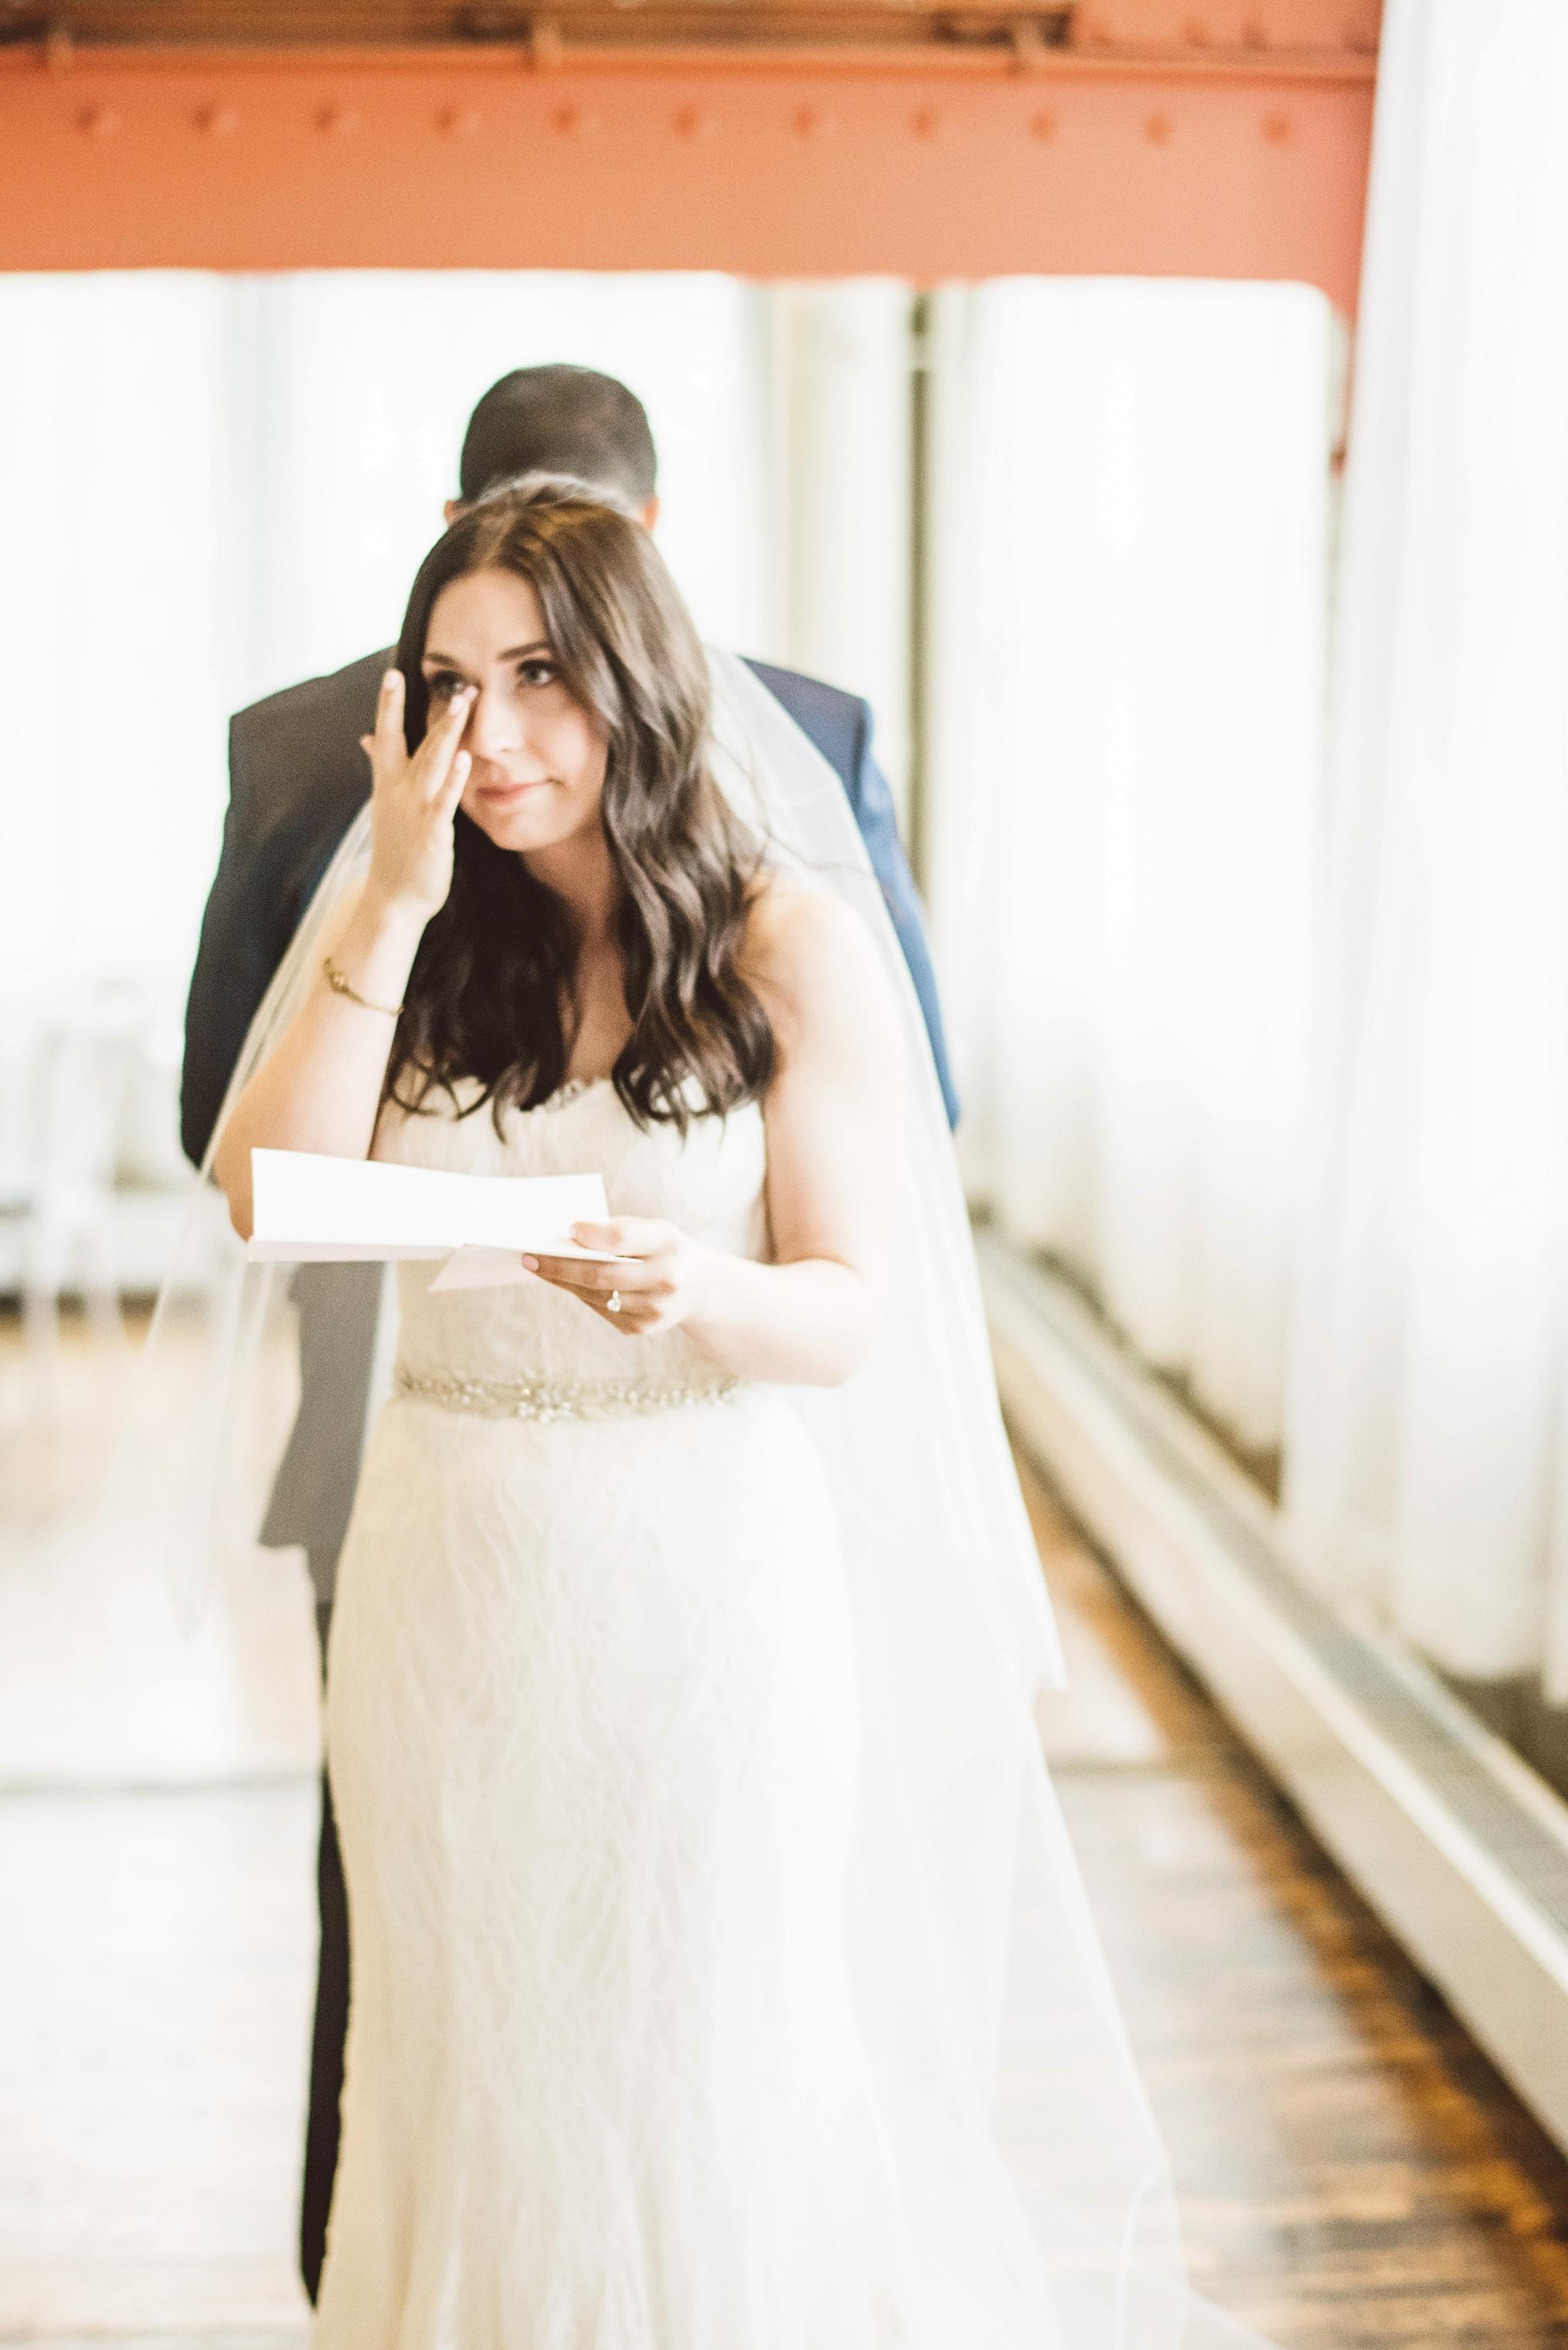 best_wedding_photography_2017_by_lucas_botz_photography_214.jpg